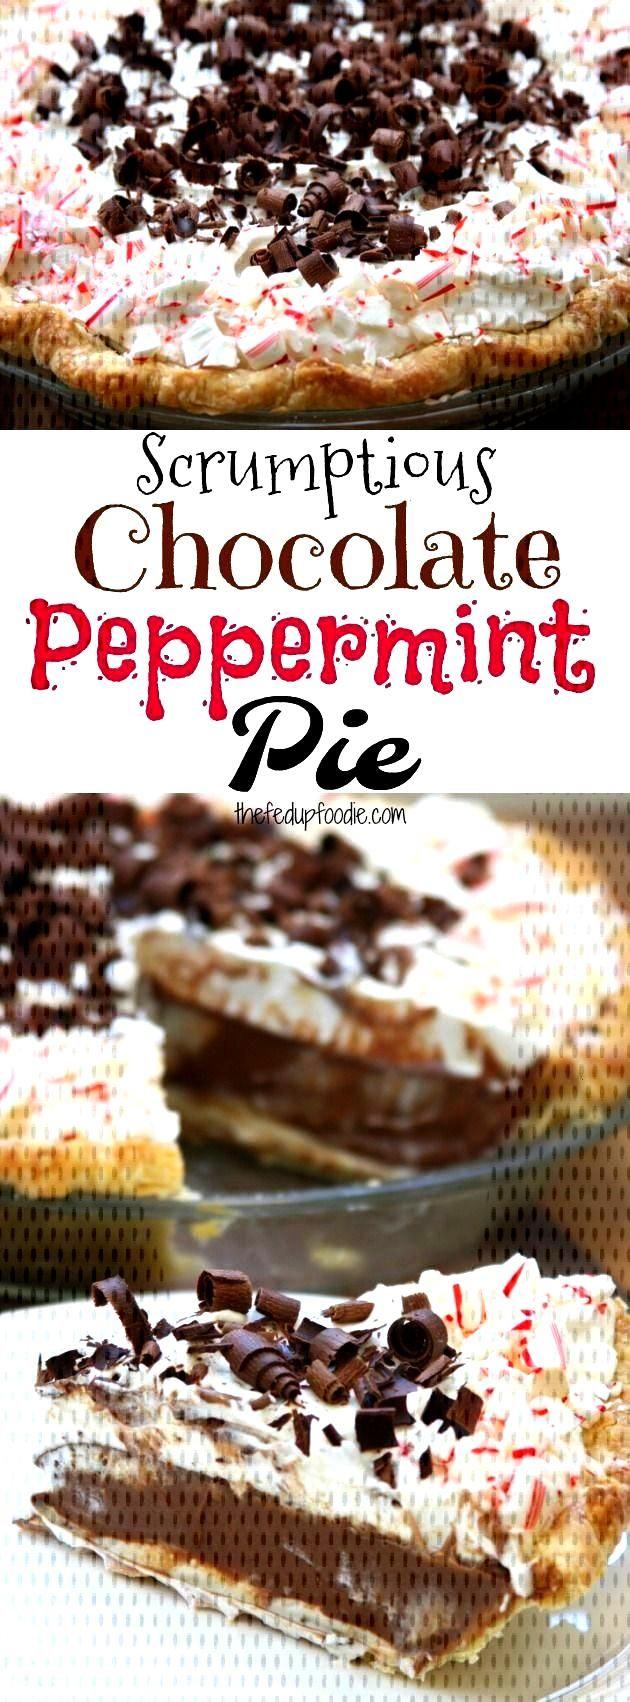 Scrumptious Chocolate Peppermint Pie  - pies -